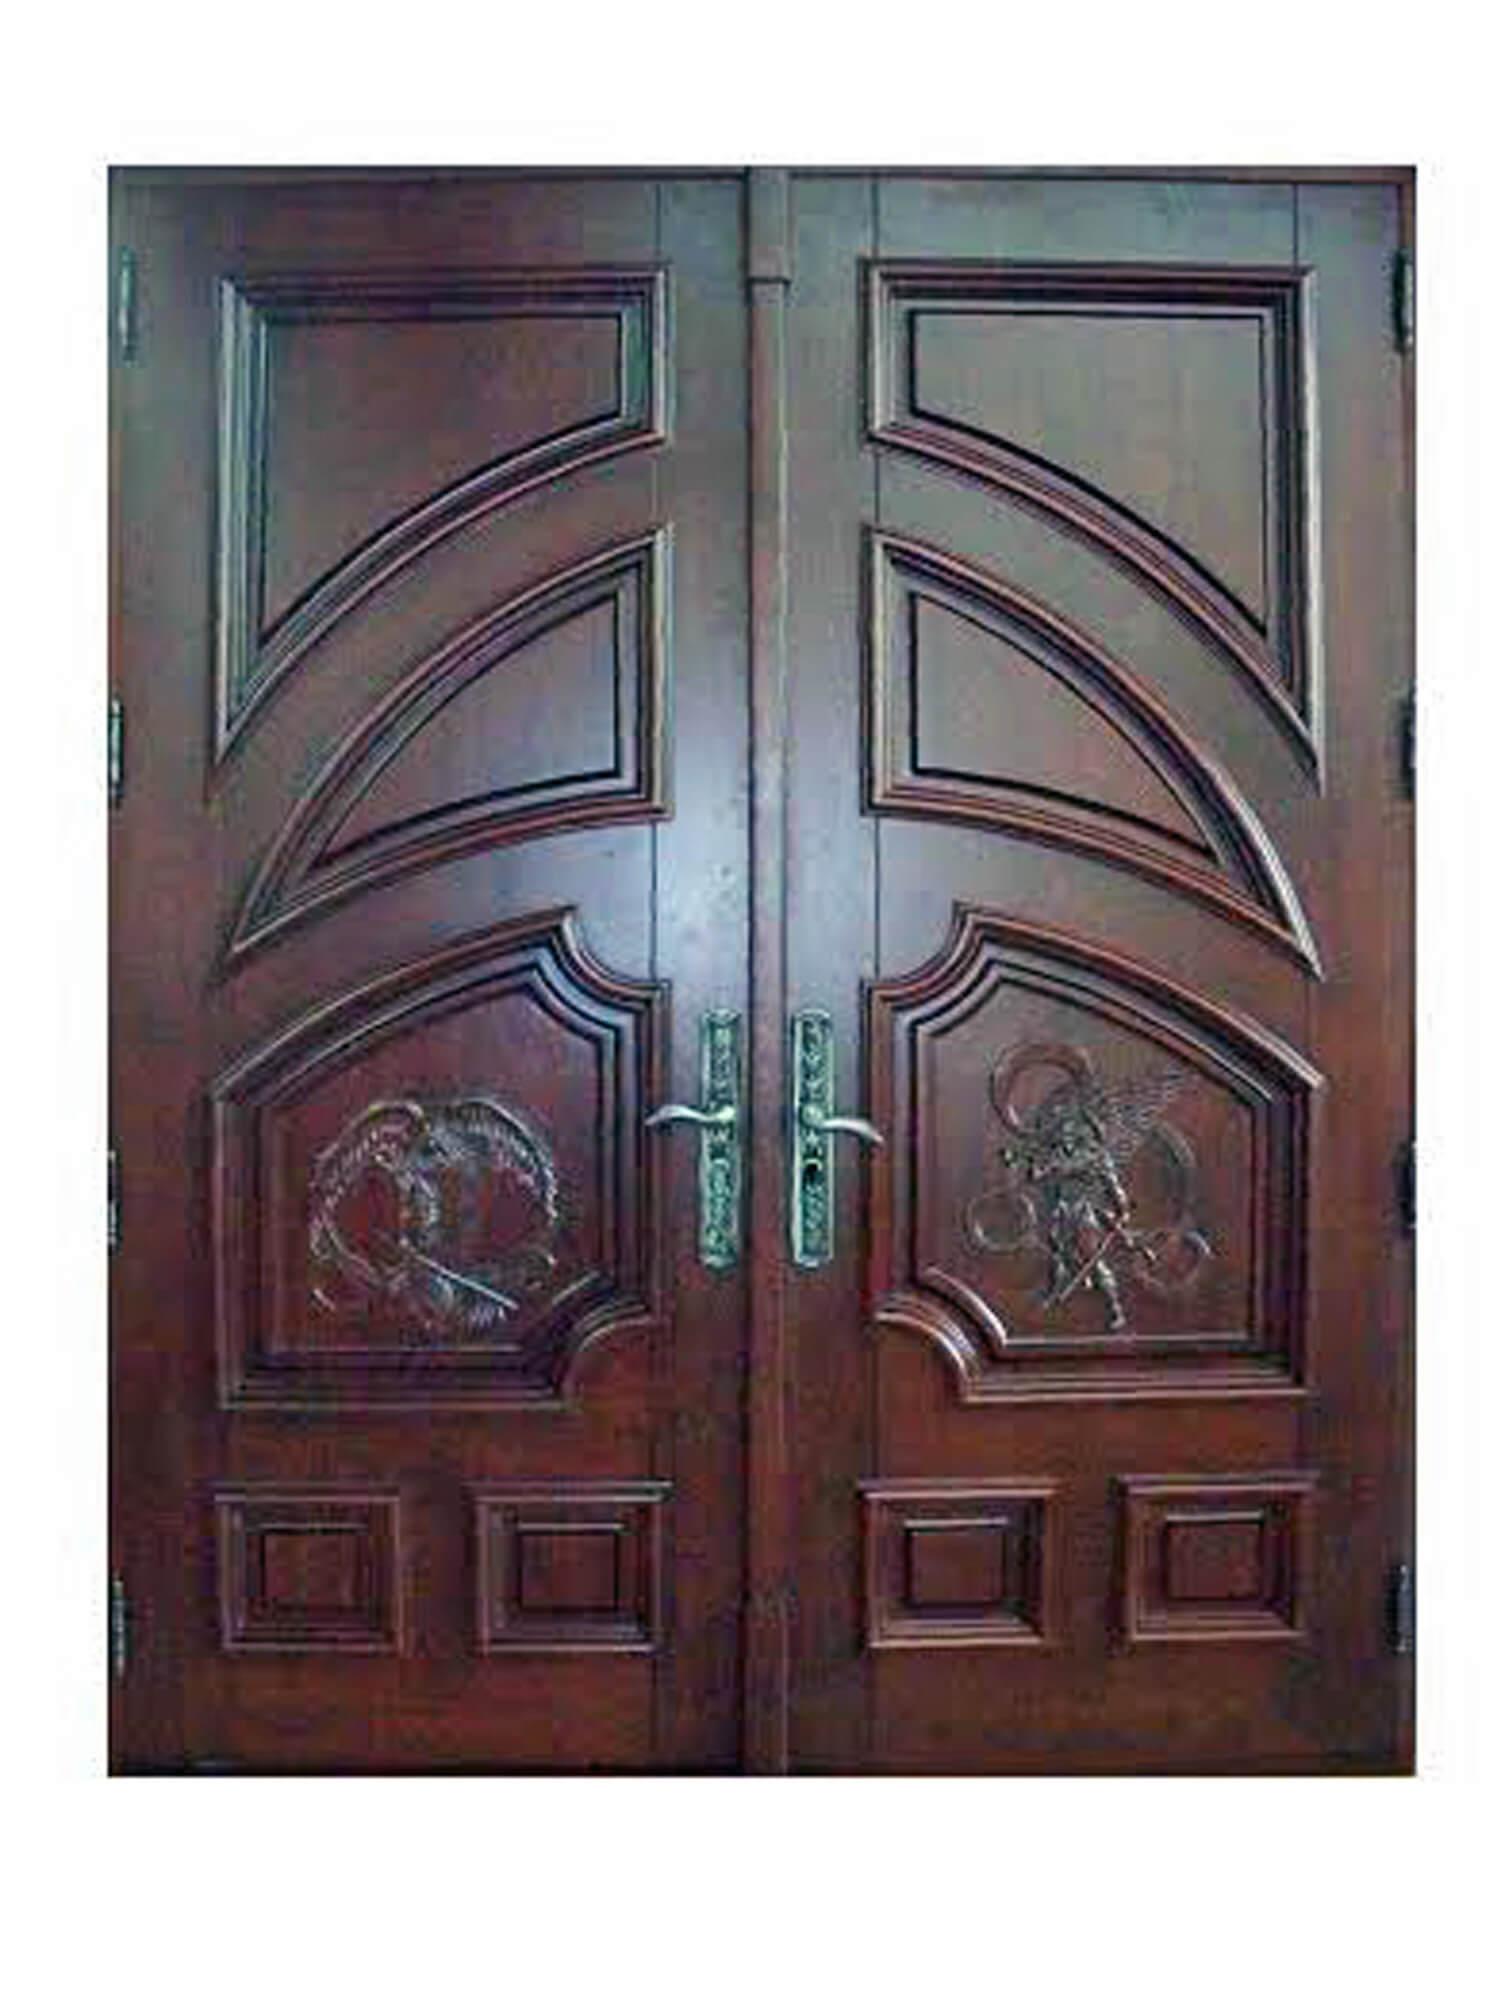 ANGELES MAHOGANY CARVED DOOR.